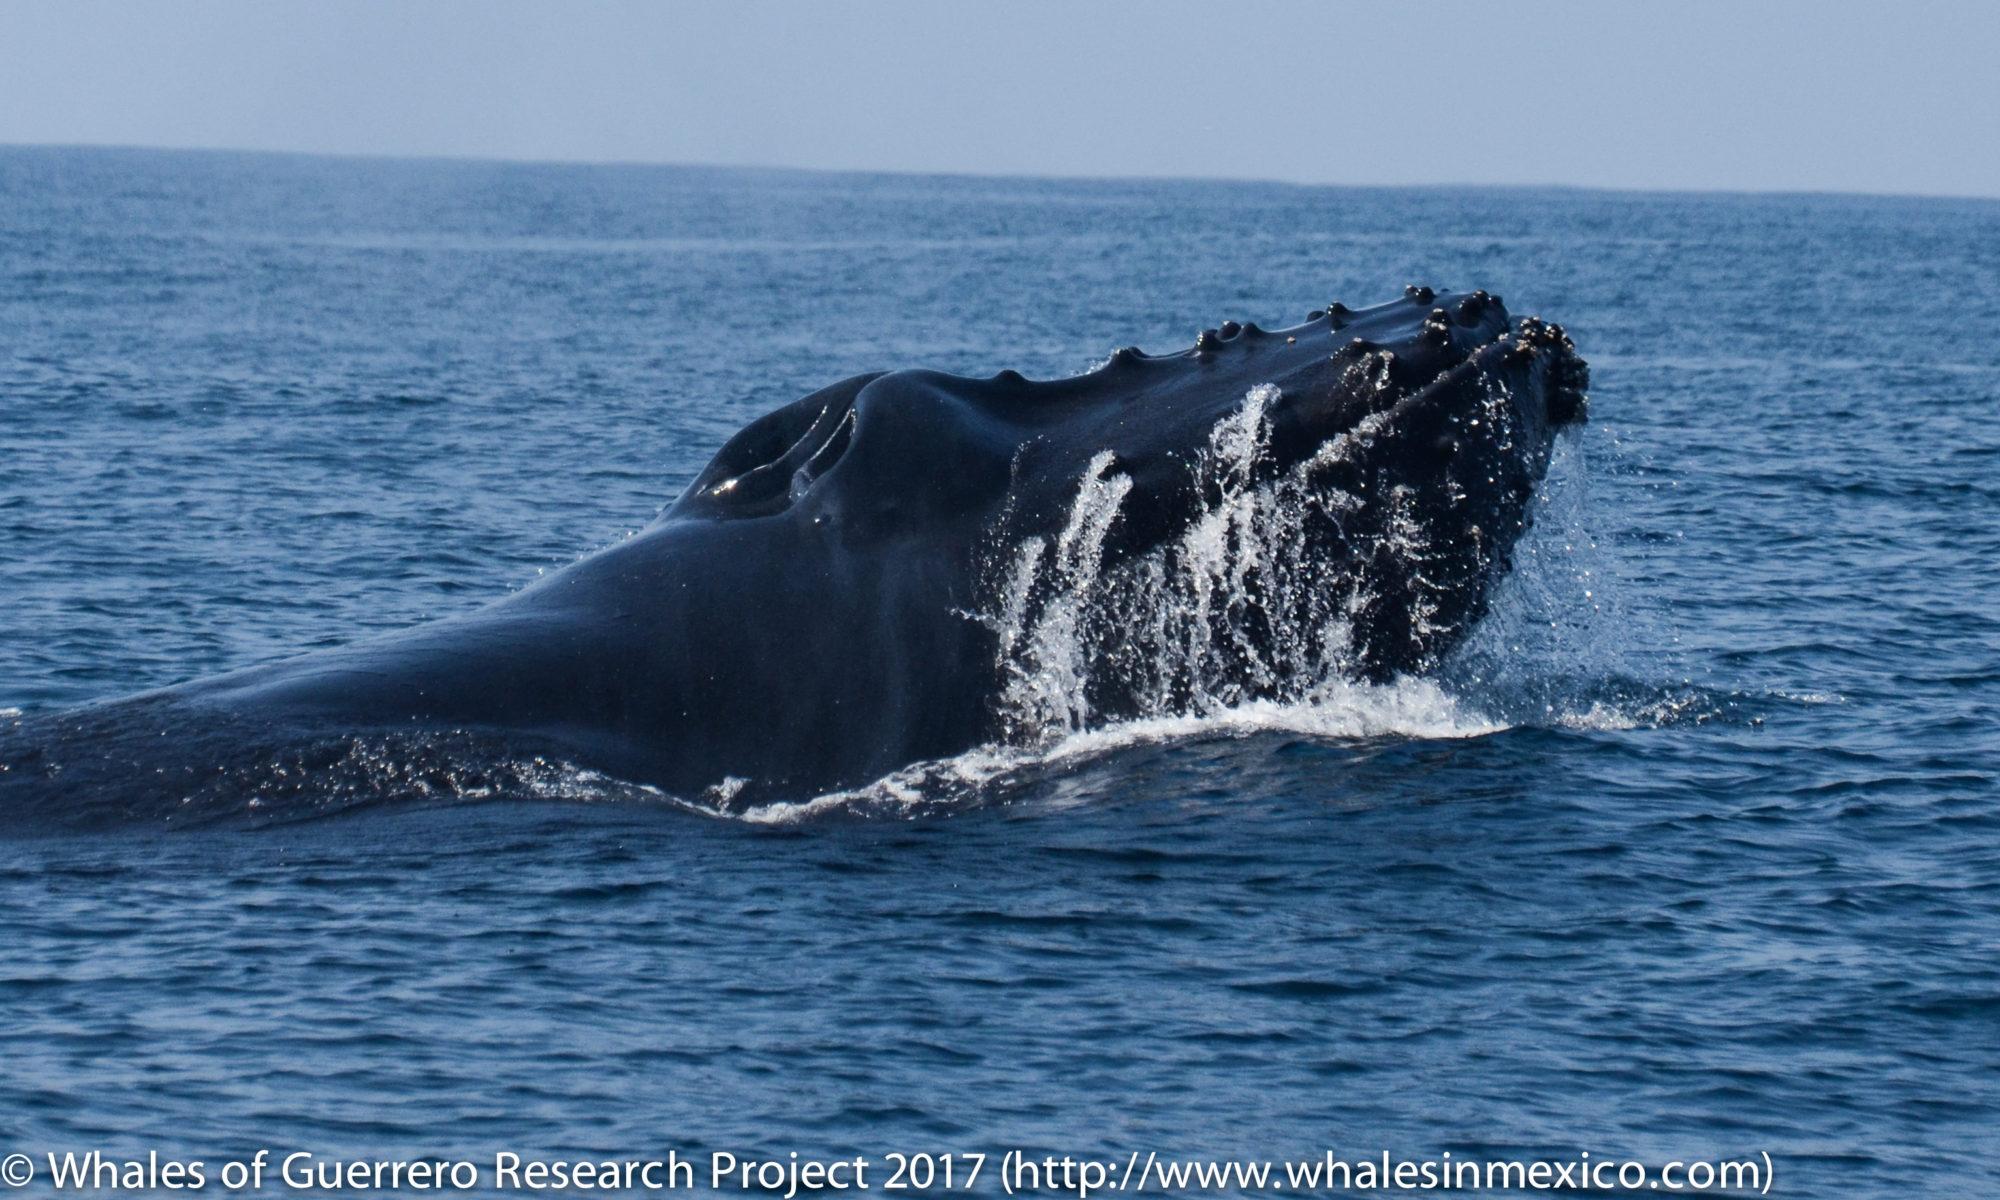 Whales of Guerrero